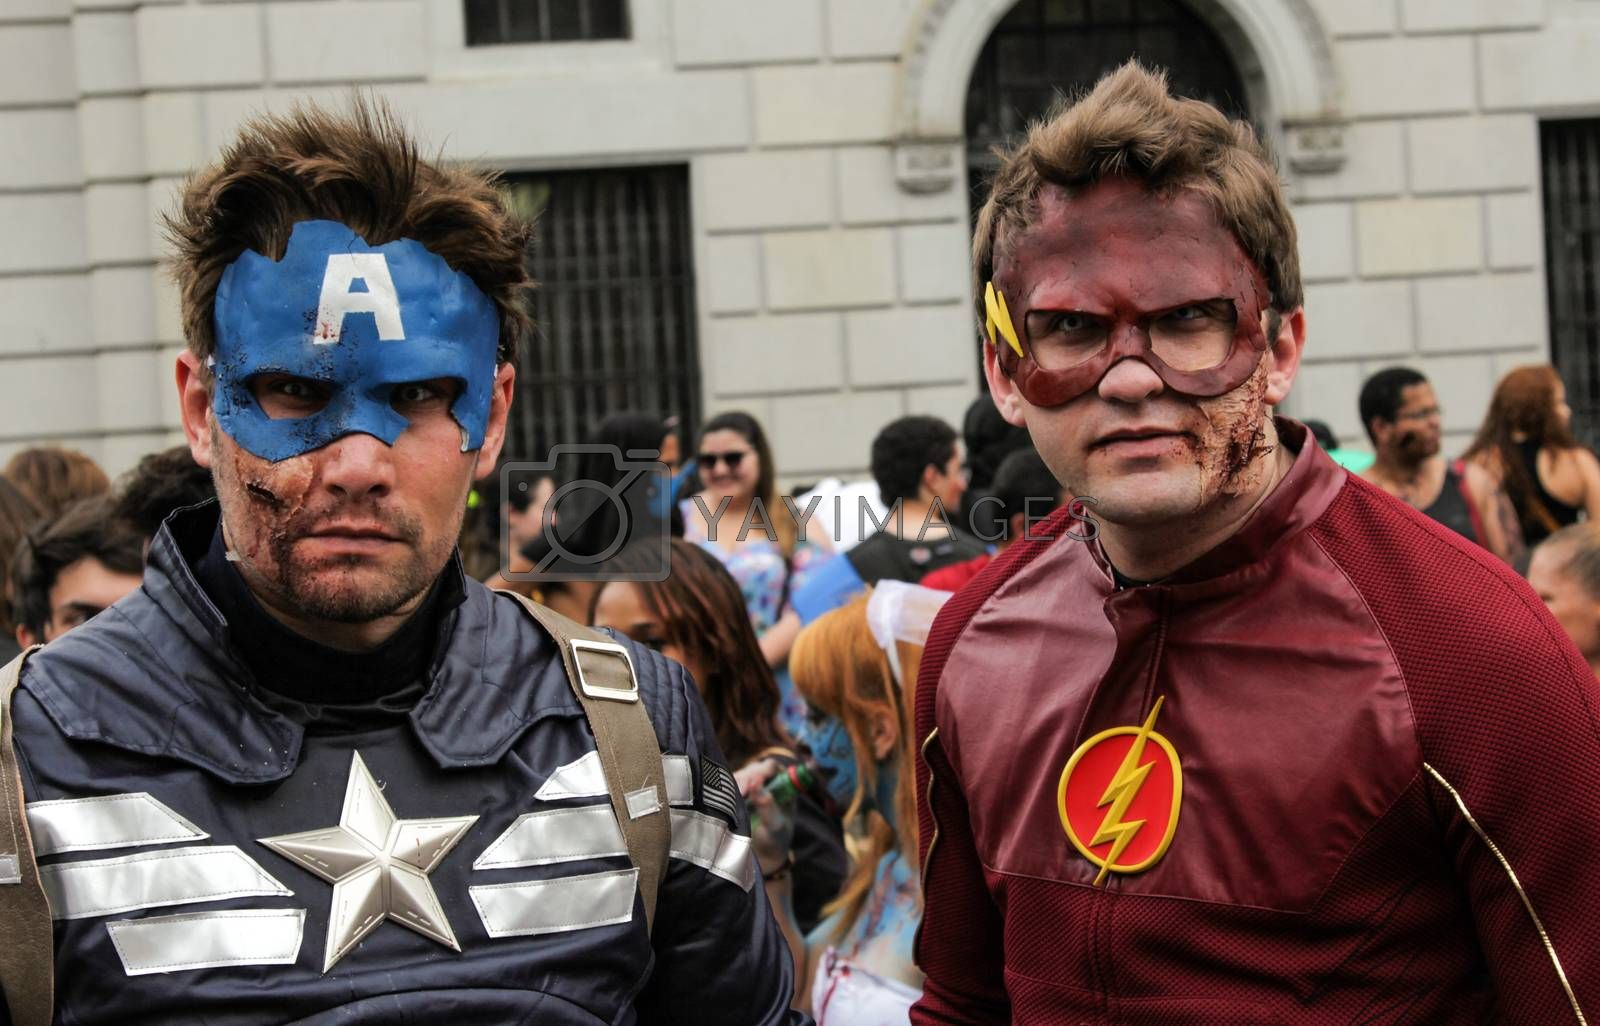 Sao Paulo, Brazil November 11 2015: Two unidentified men in super heroes costumes in the annual event Zombie Walk in Sao Paulo Brazil.